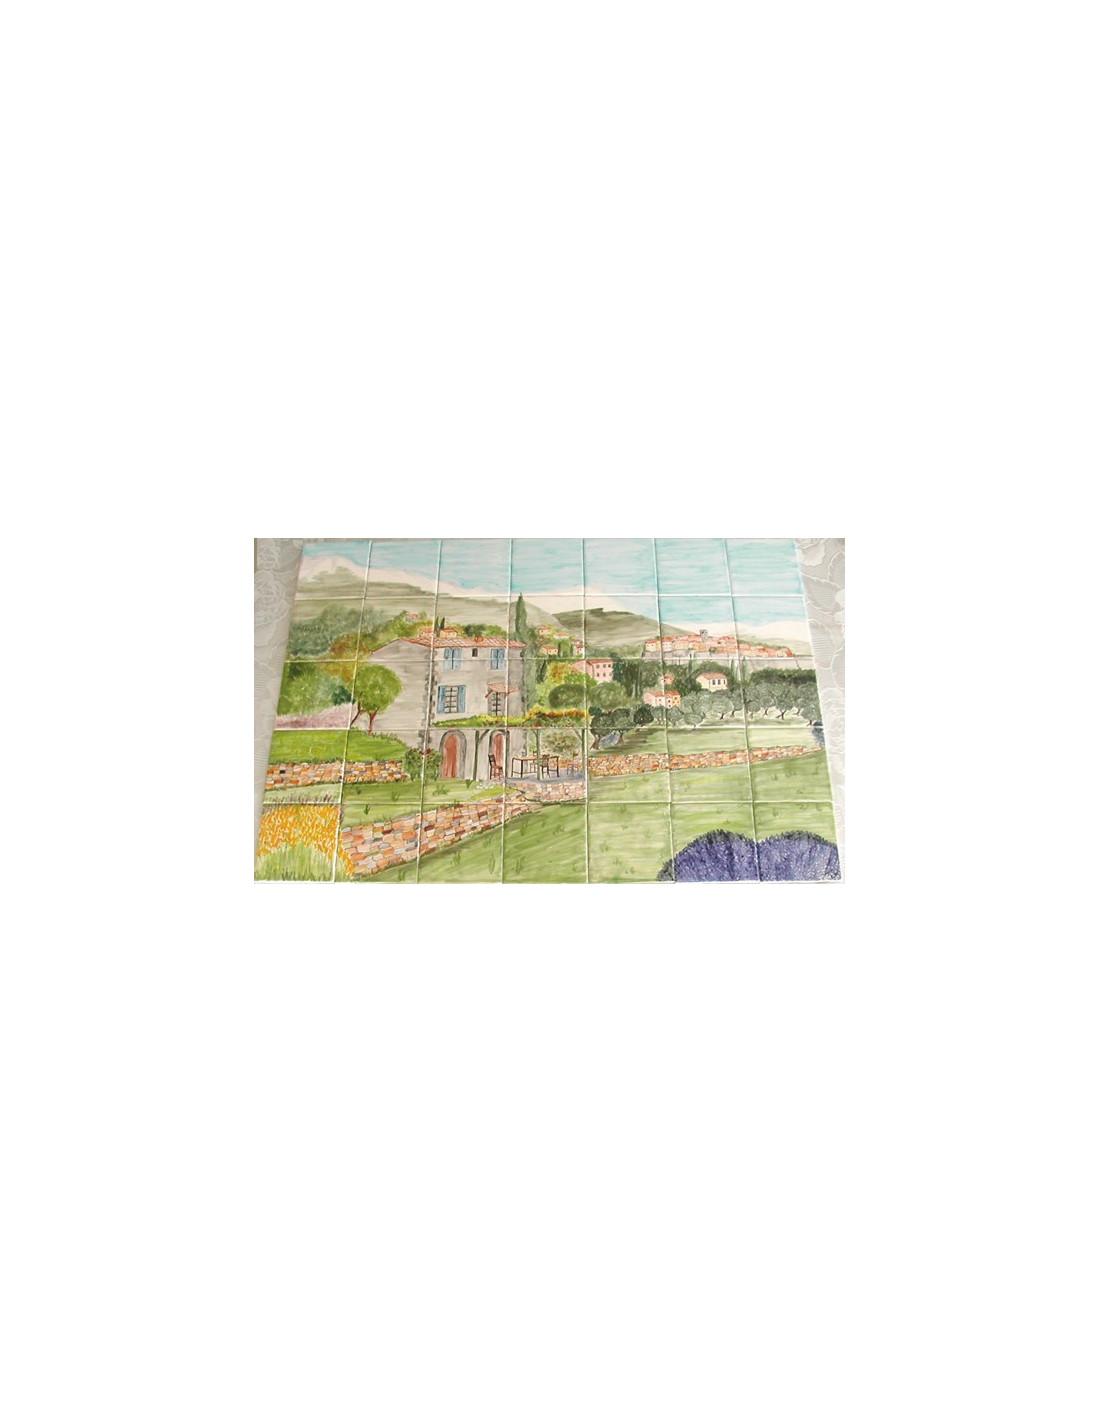 Fresque murale carrelage d cor bastide arri re pays ni ois for Fresque murale carrelage